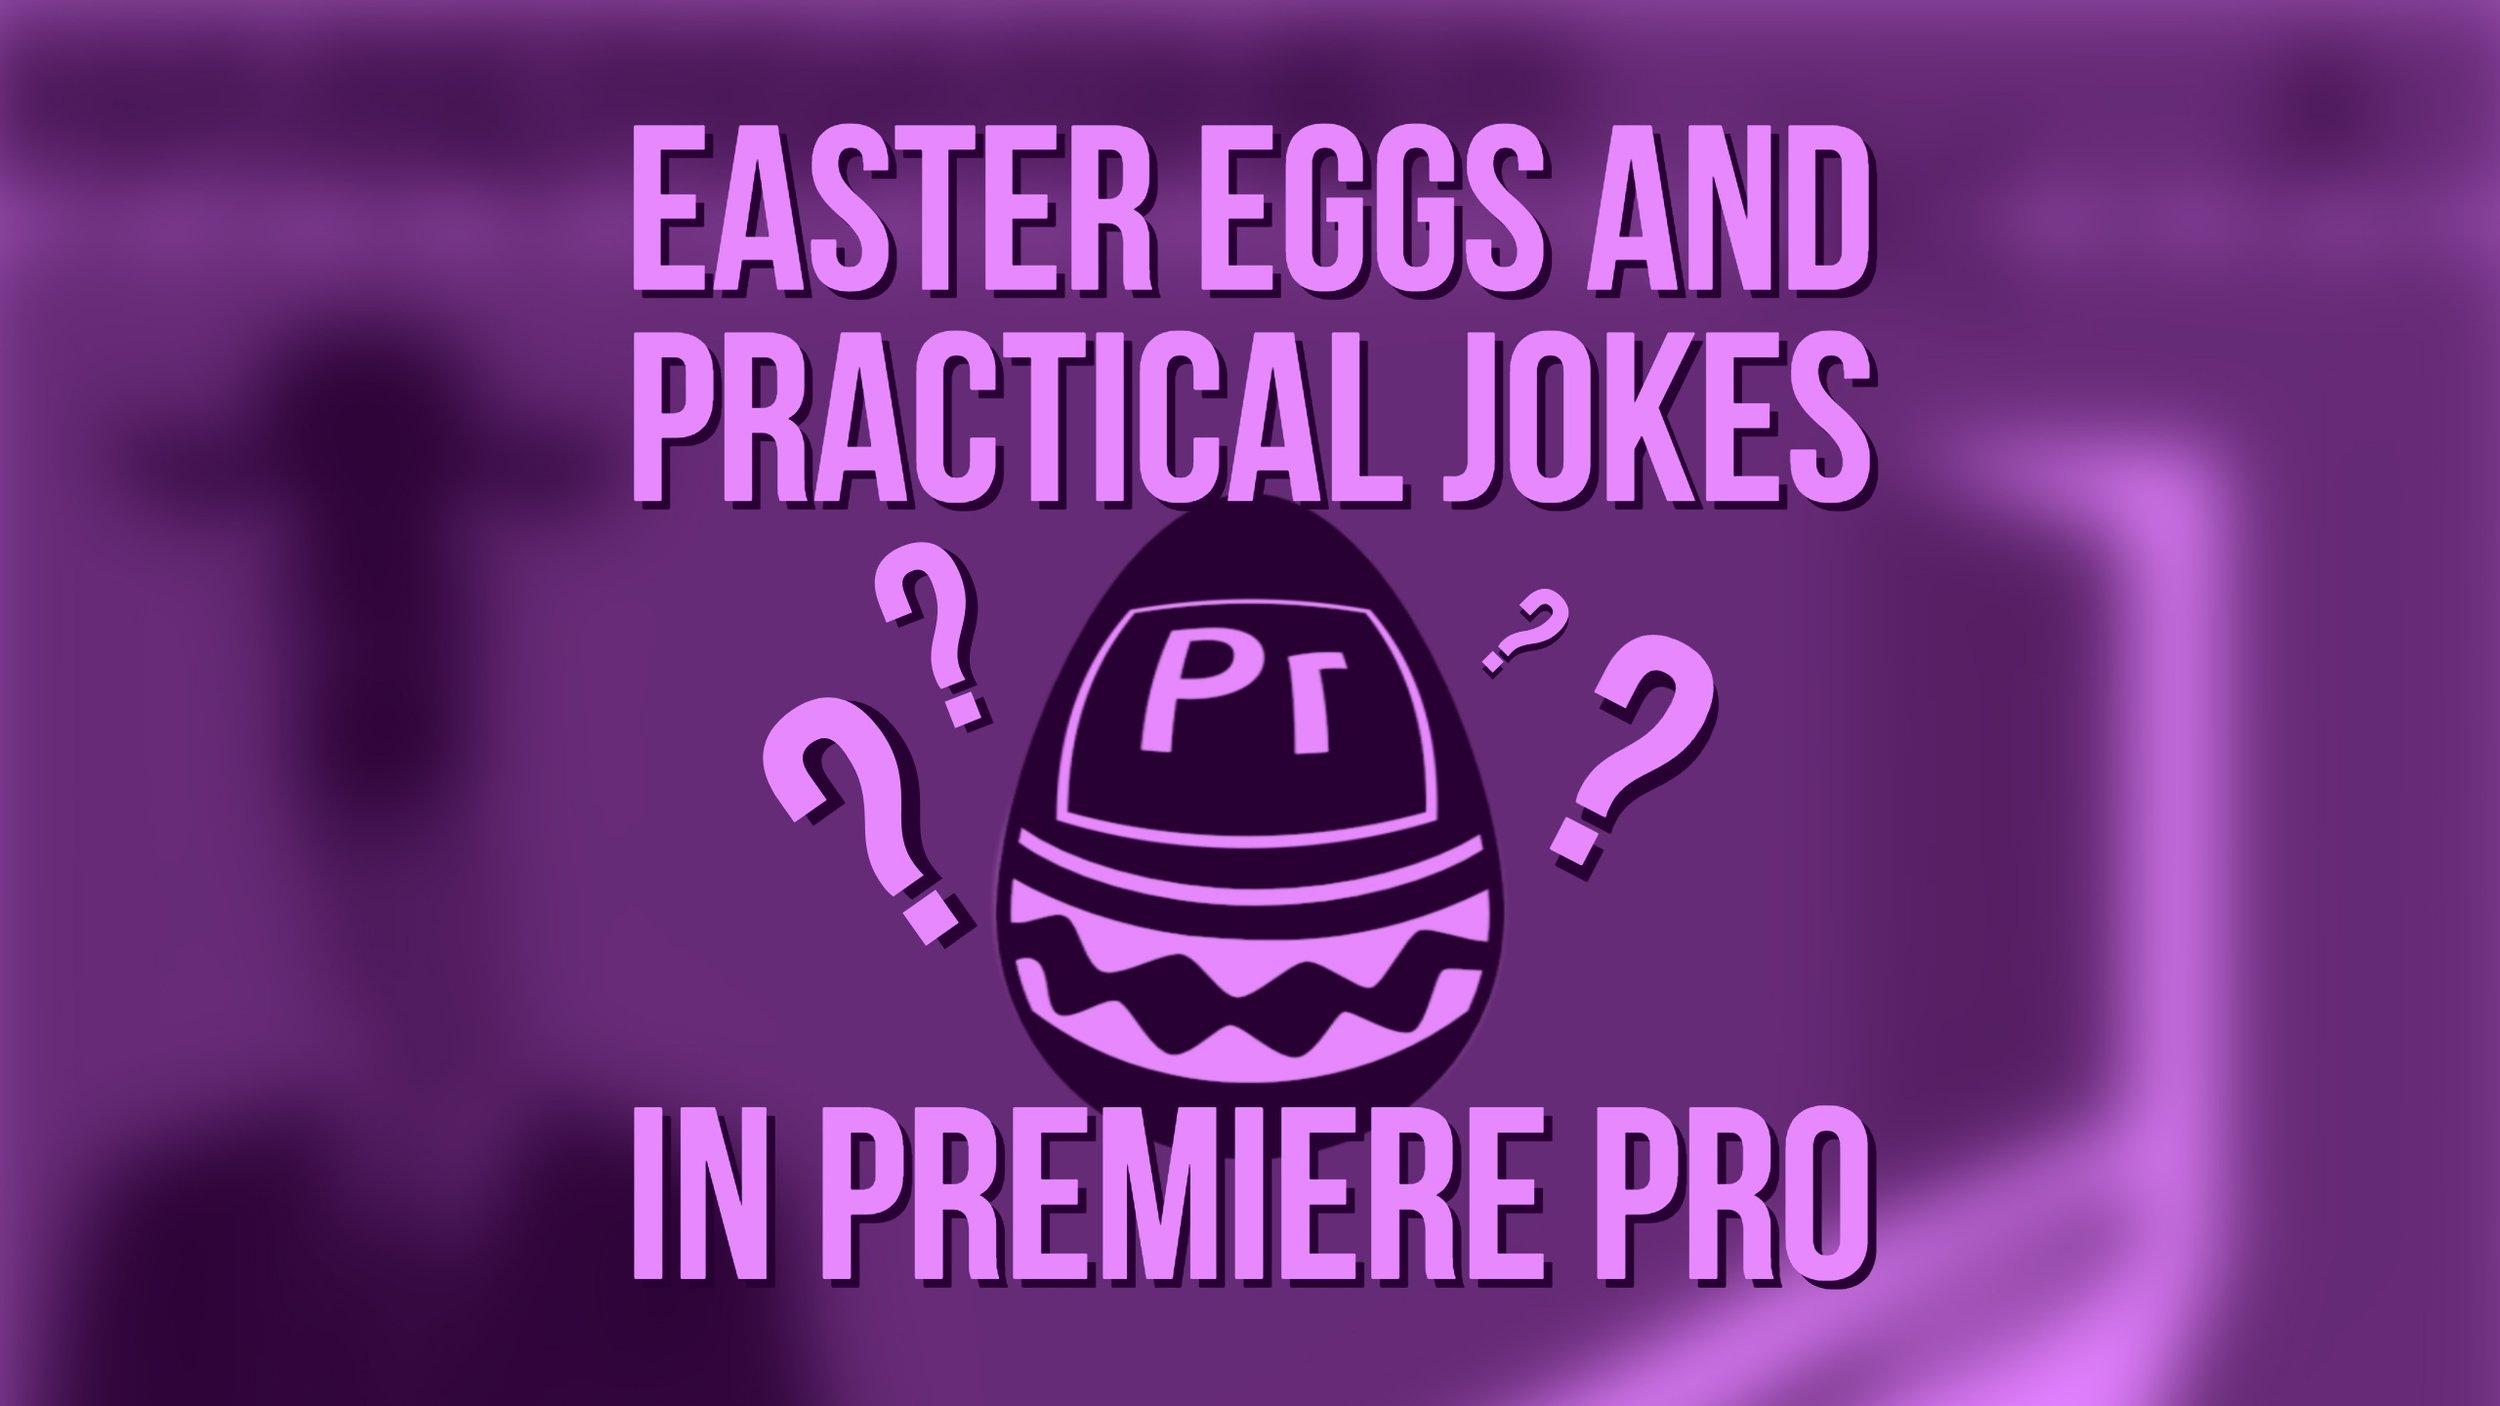 easter-eggs-practical-jokes-premiere-pro